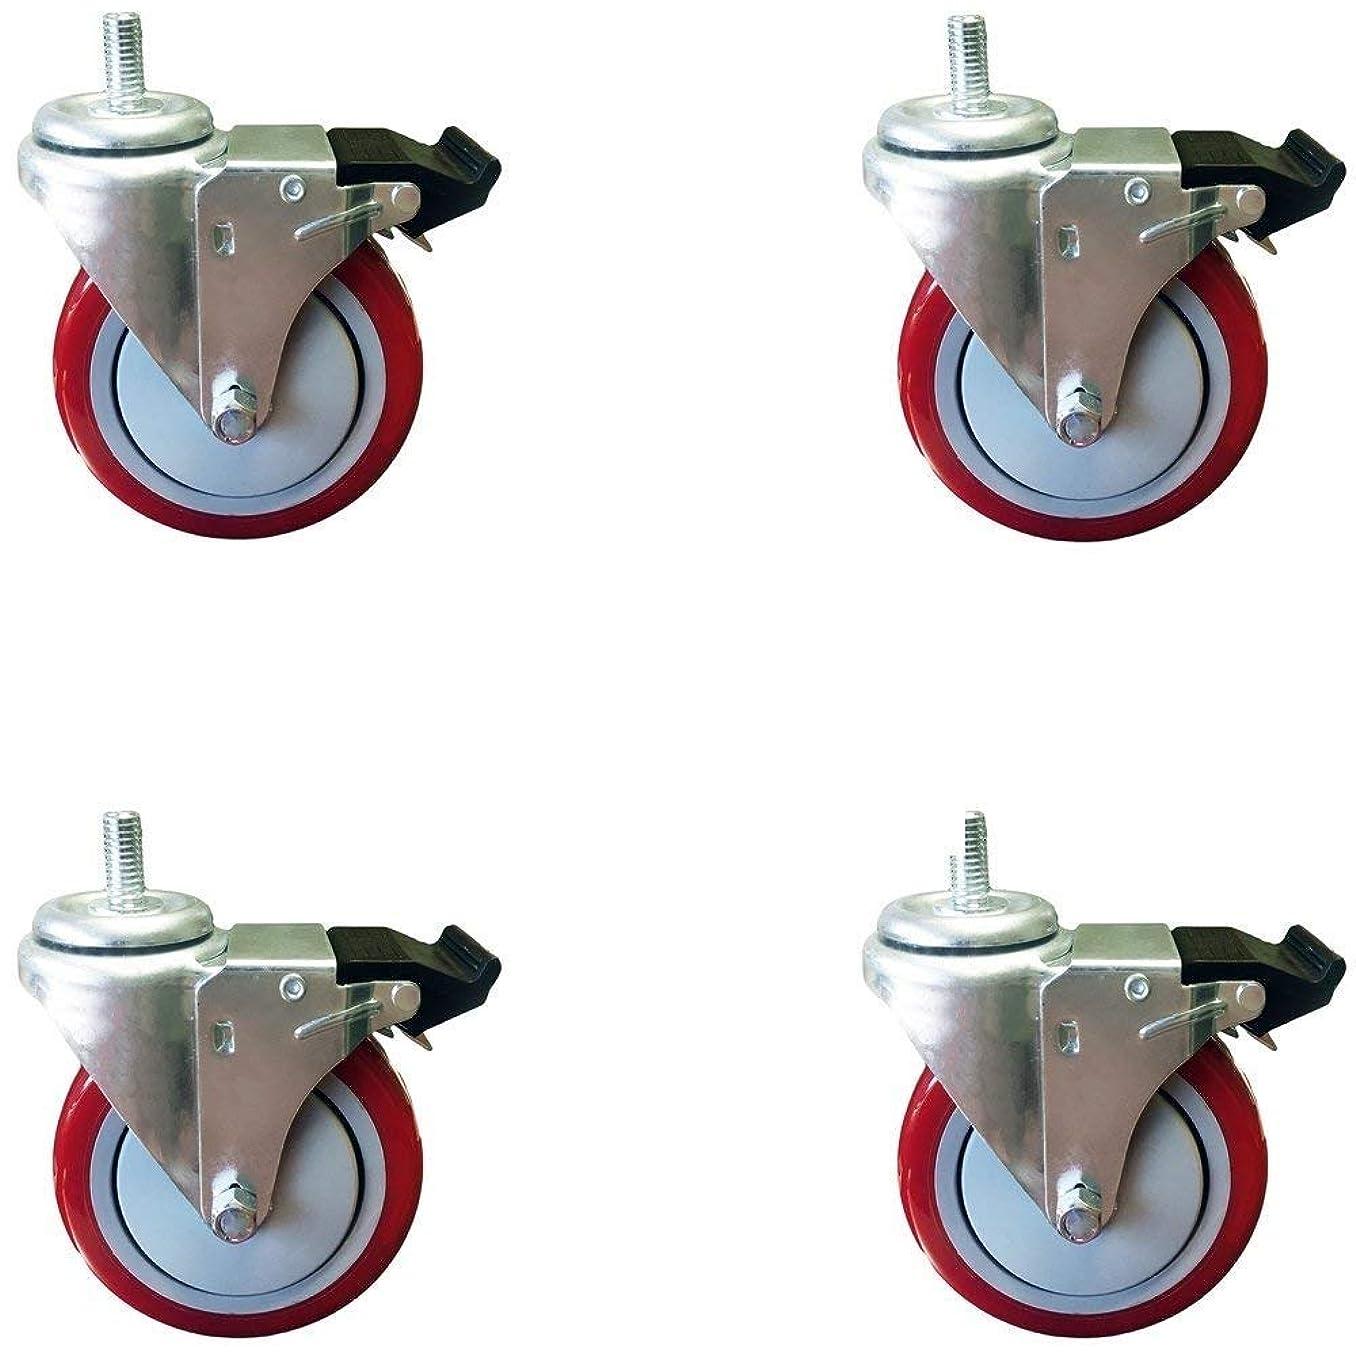 5 Inch Total Lock Caster - Red Polyurethane Wheel - 1/2